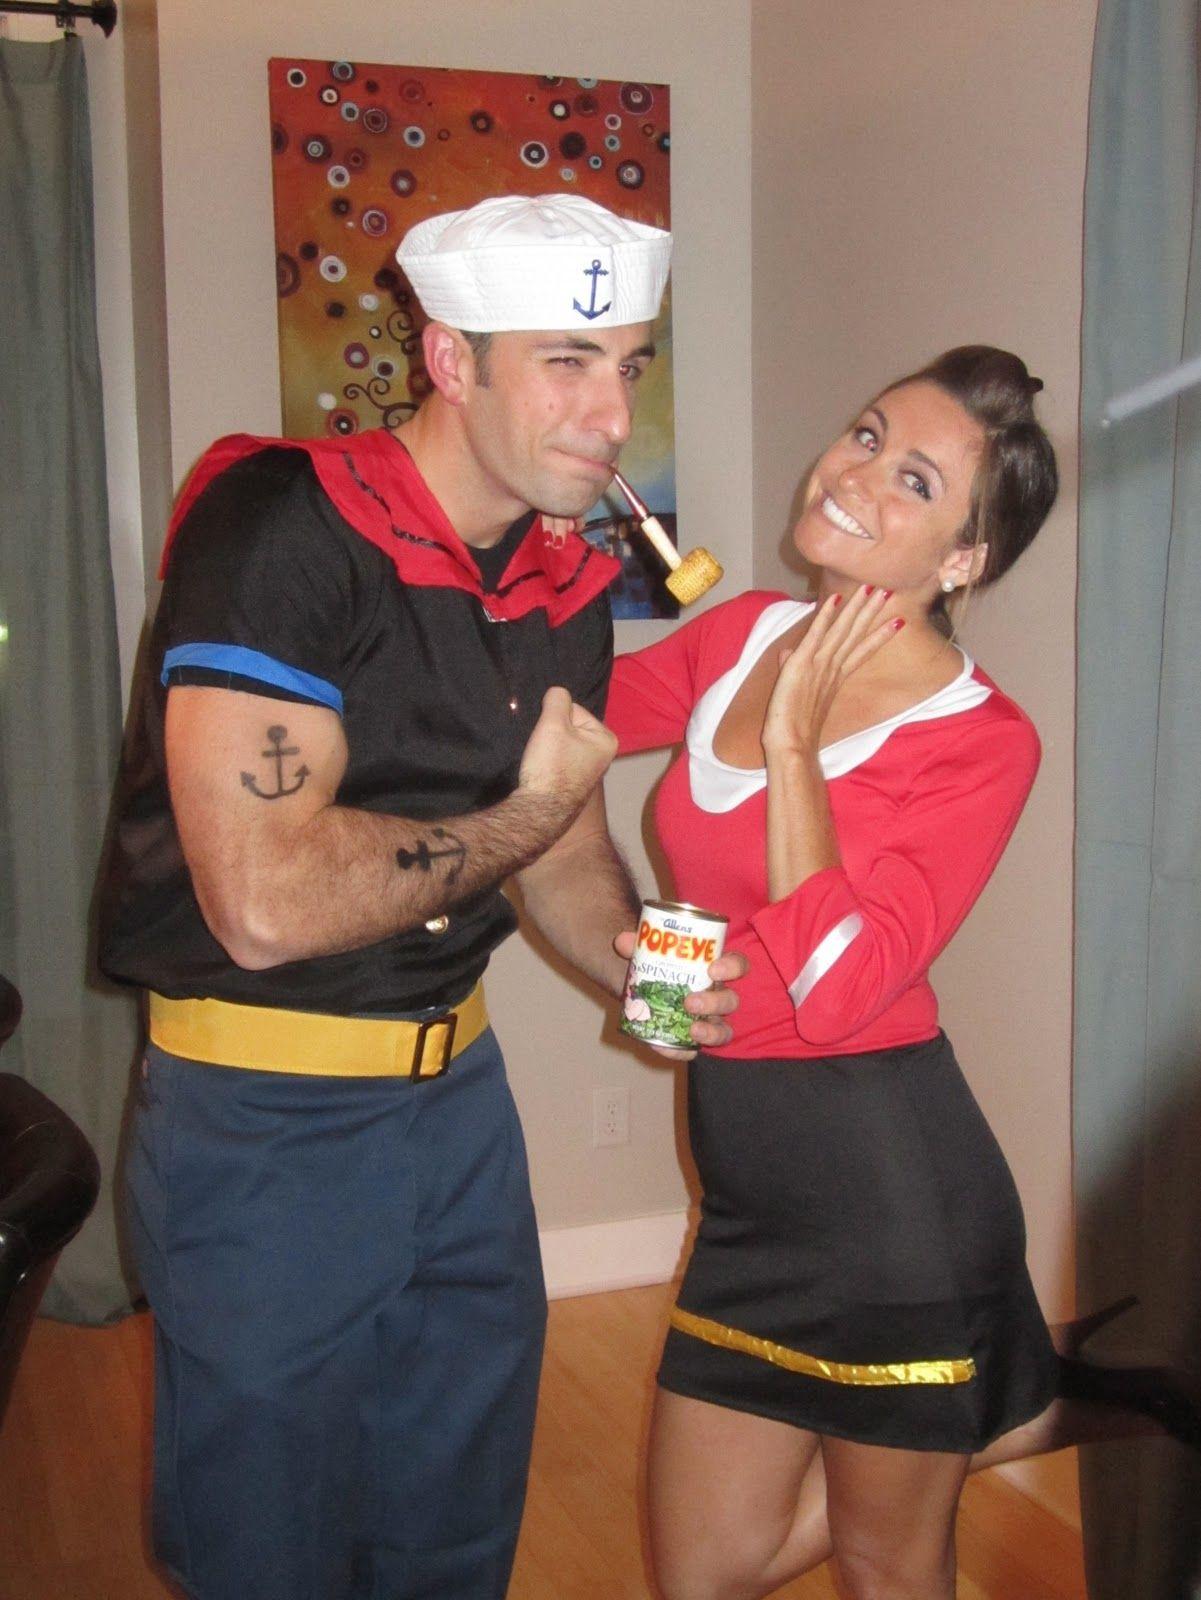 Popeye olive oyl costumes pinterest popeye olive oyl genius diy couples costumes for halloween diy halloween do it yourself halloween costumes diy halloween ideas diy halloween costumes kids halloween costumes solutioingenieria Images